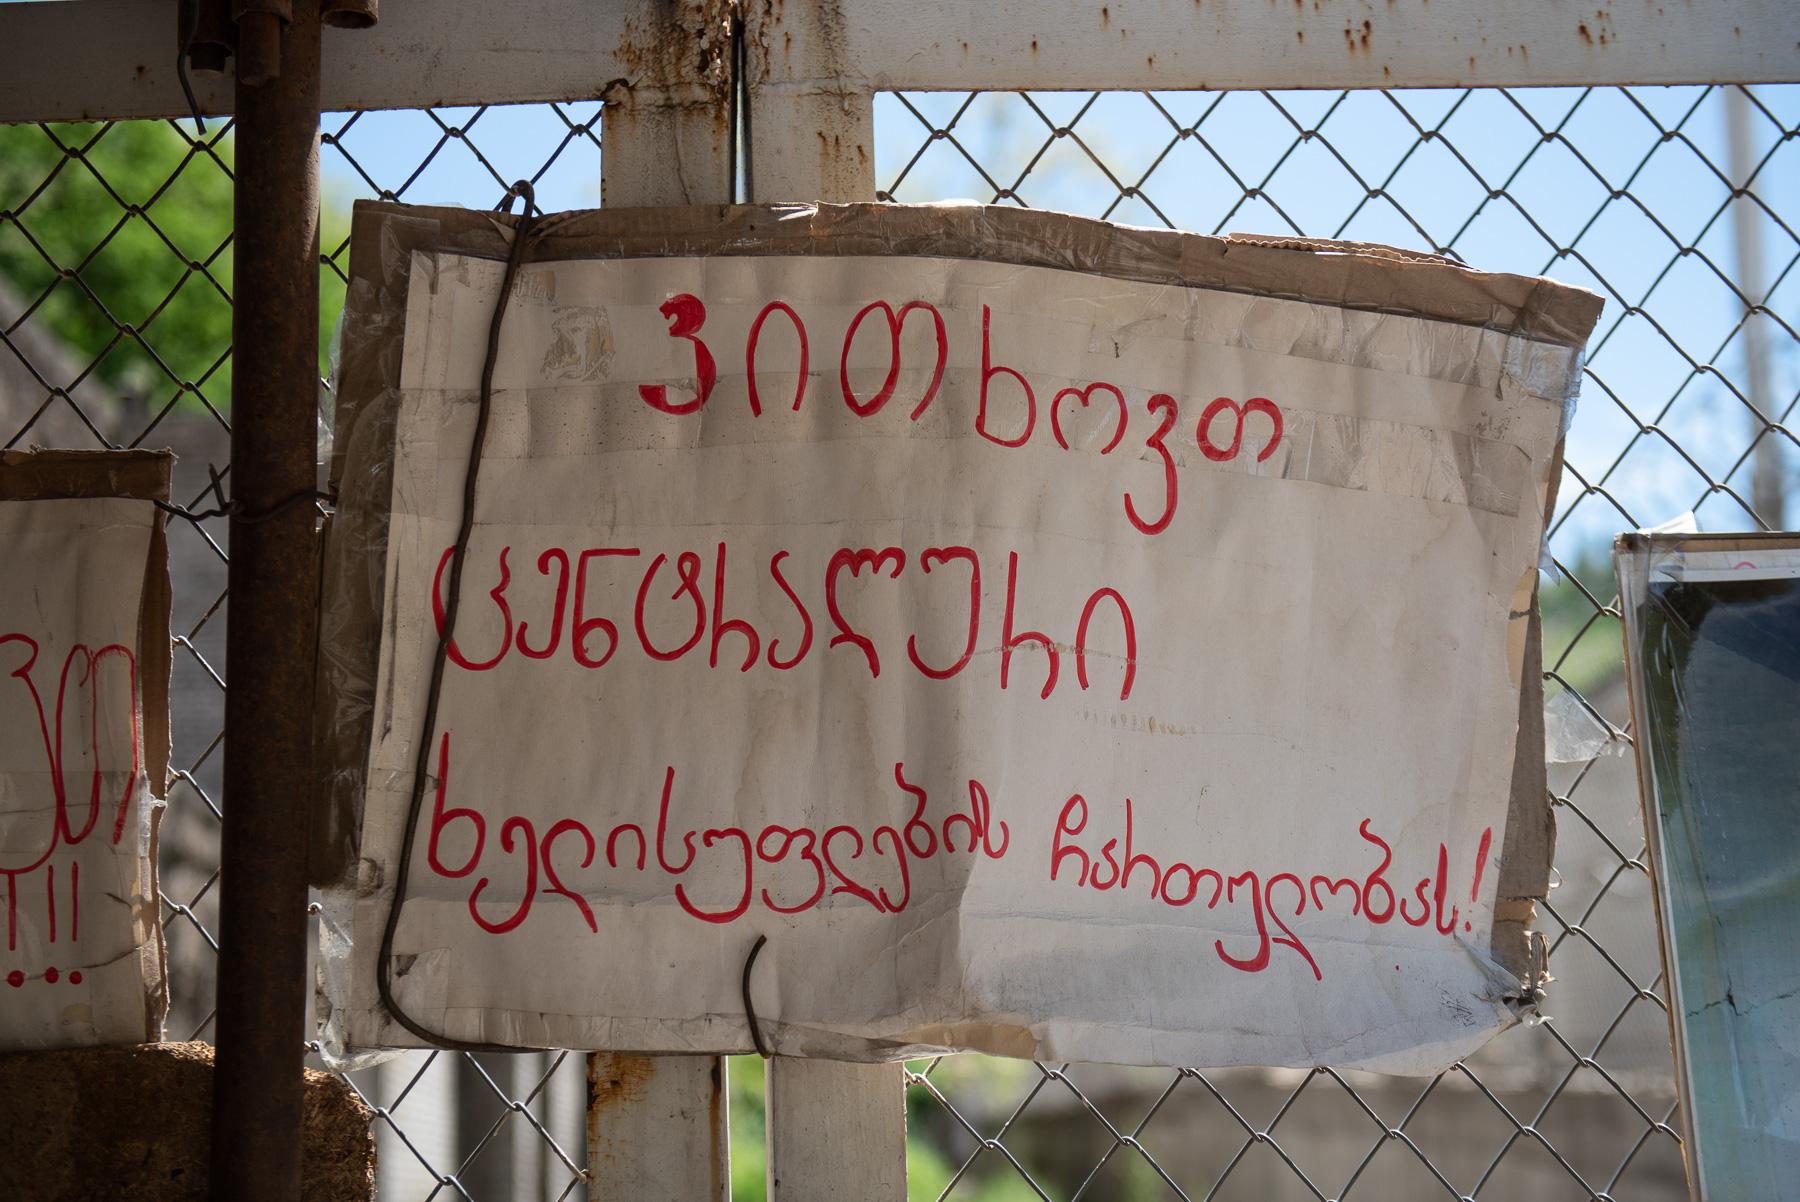 'We demand the involvement of the central government'. Photo: Mariam Nikuradze/OC Media.